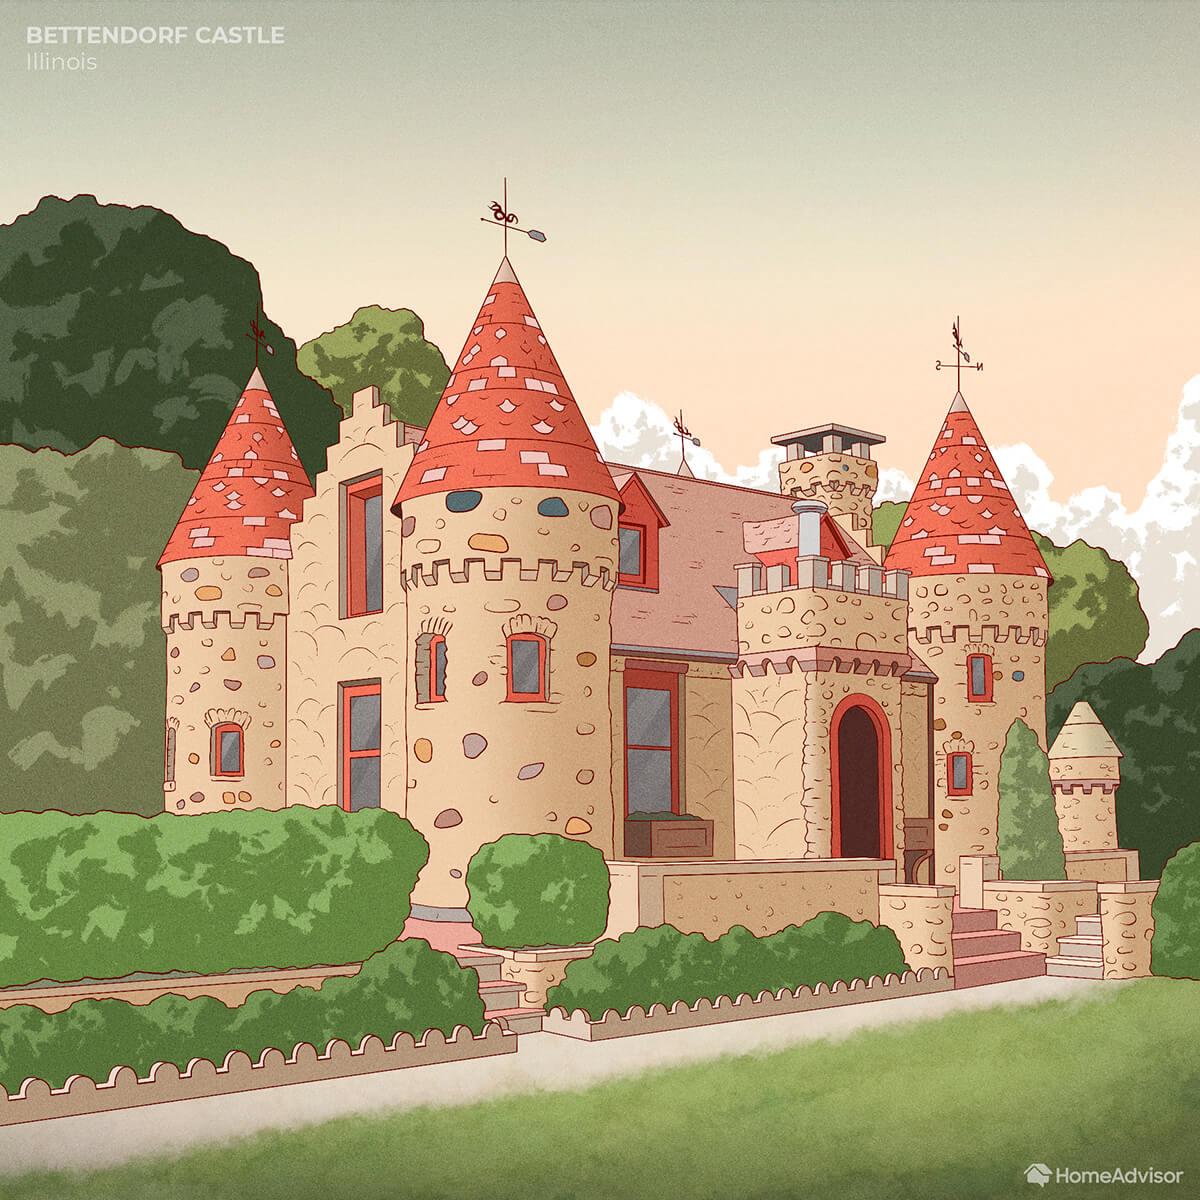 Bettendorf Castle